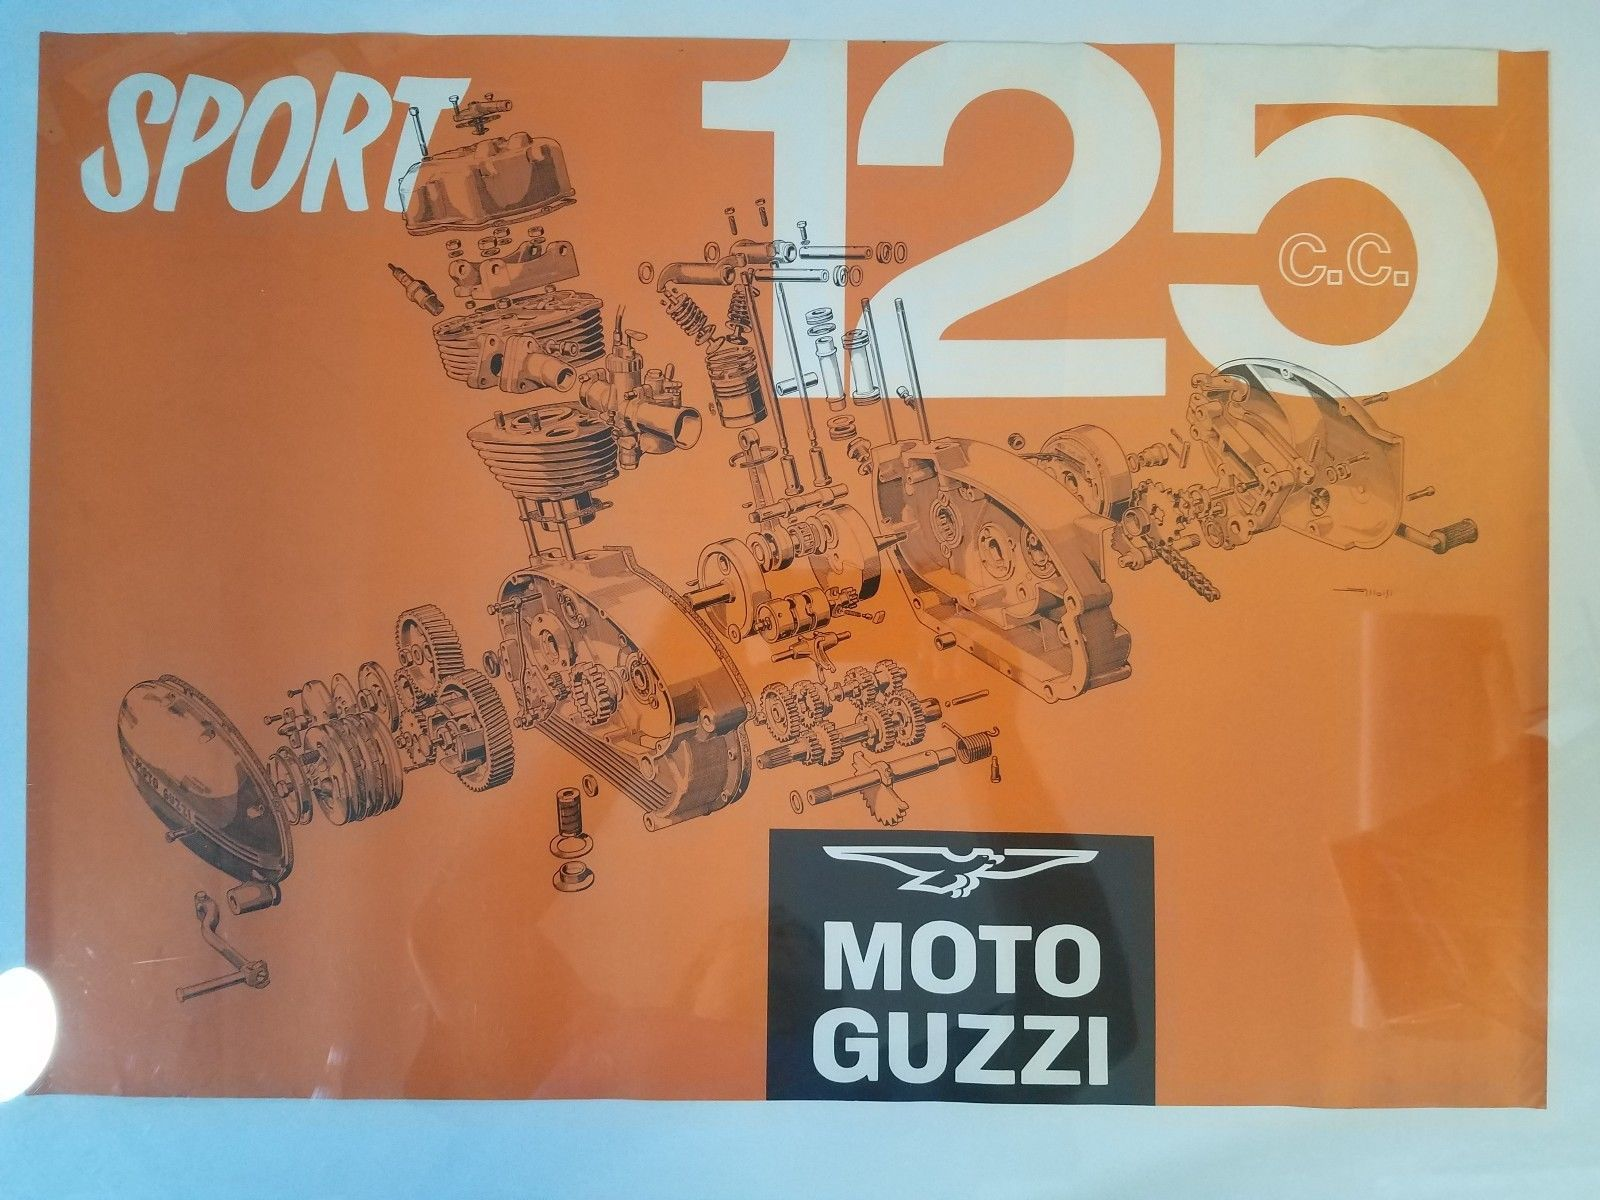 4f4866b261b Moto Guzzi 125 Sport Poster Exploded Engine and 20 similar items